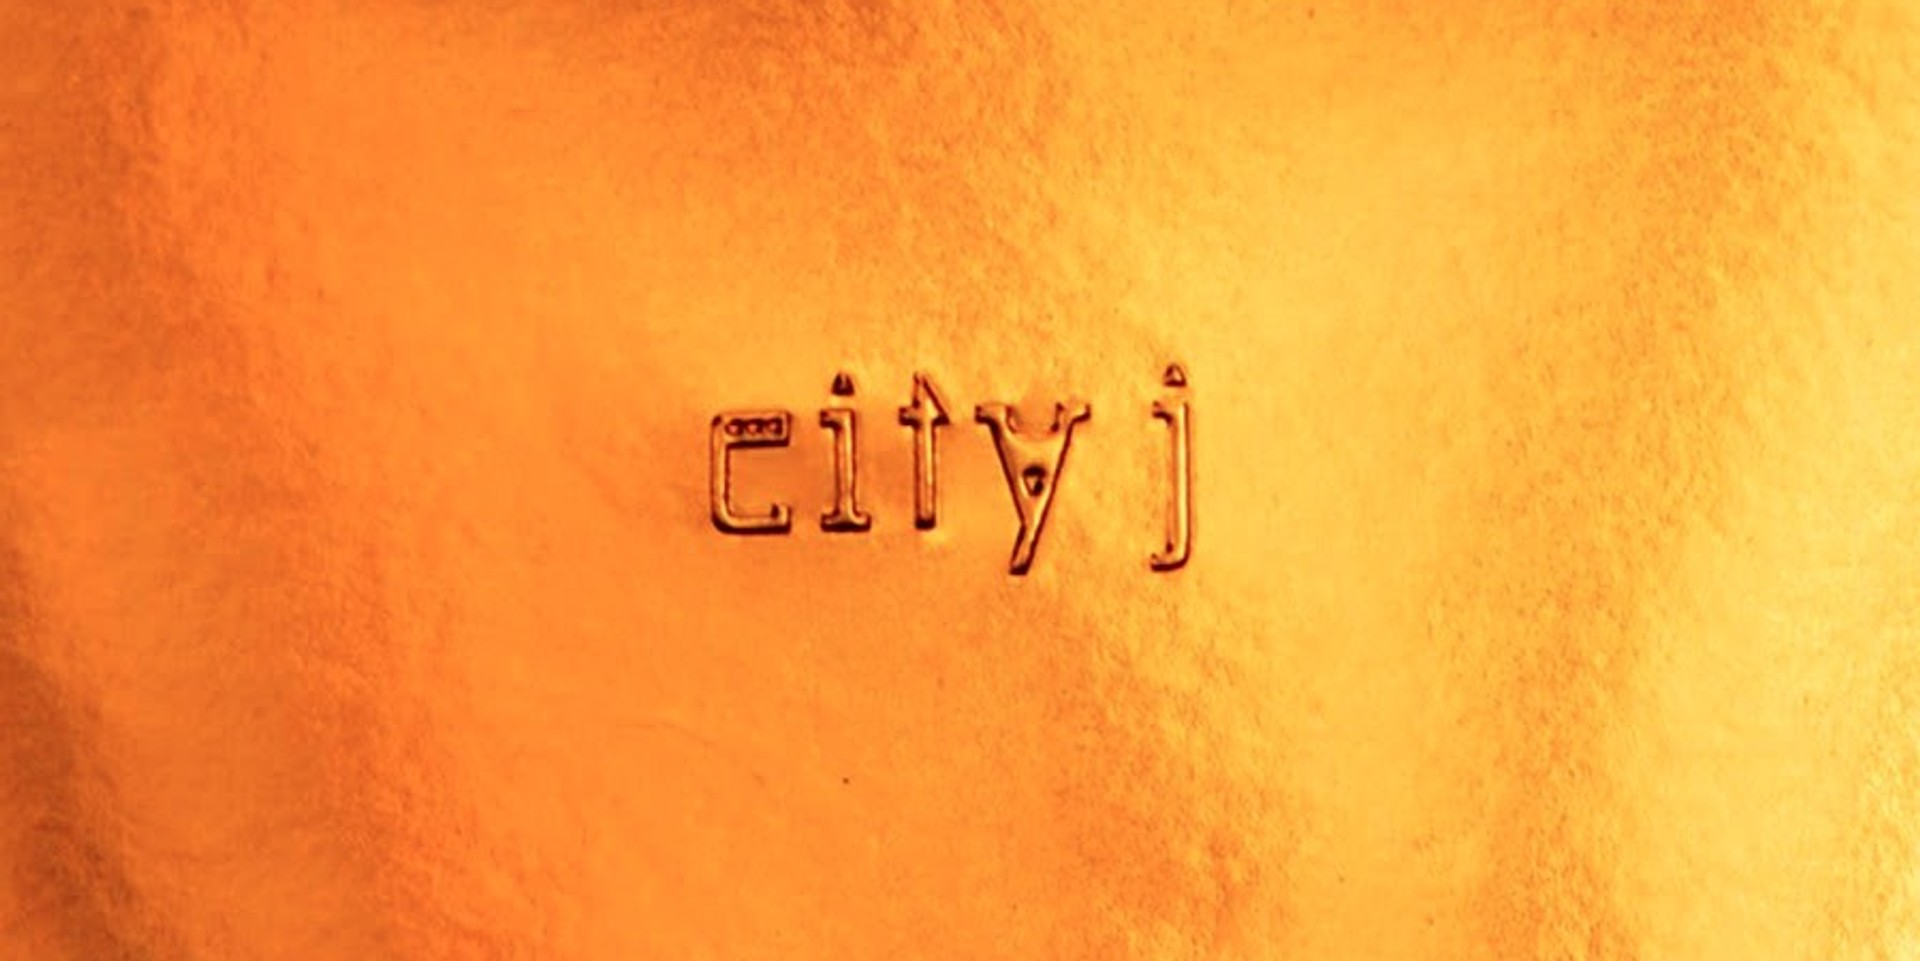 Elephant Kind signal change with new LP, City J